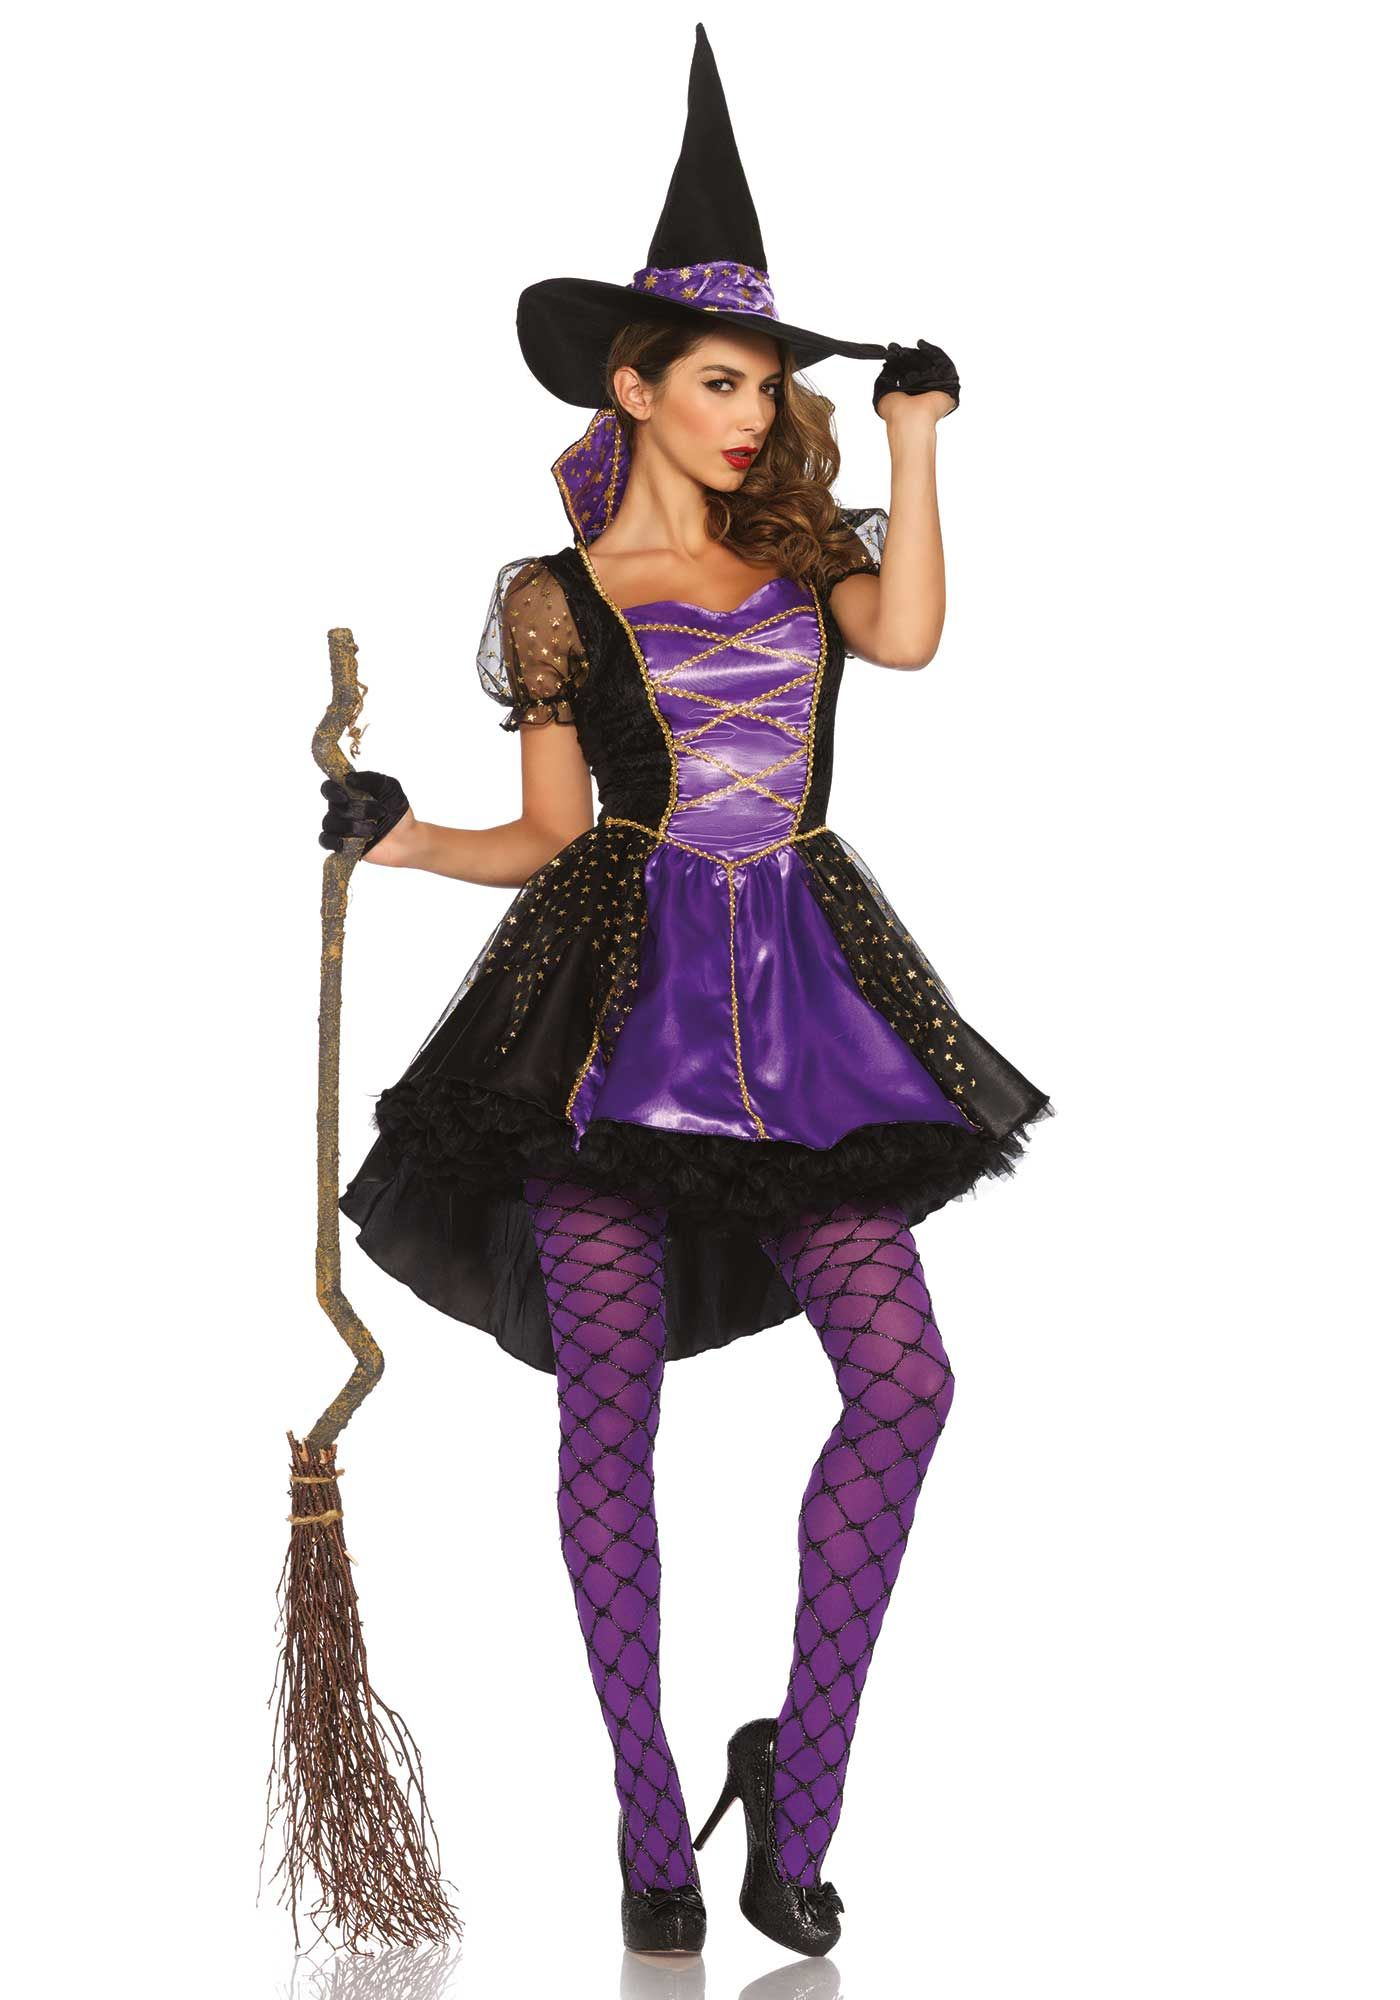 Halloween Kleding Dames.Paars Heksen Kostuum Voor Dames Halloween Halloween